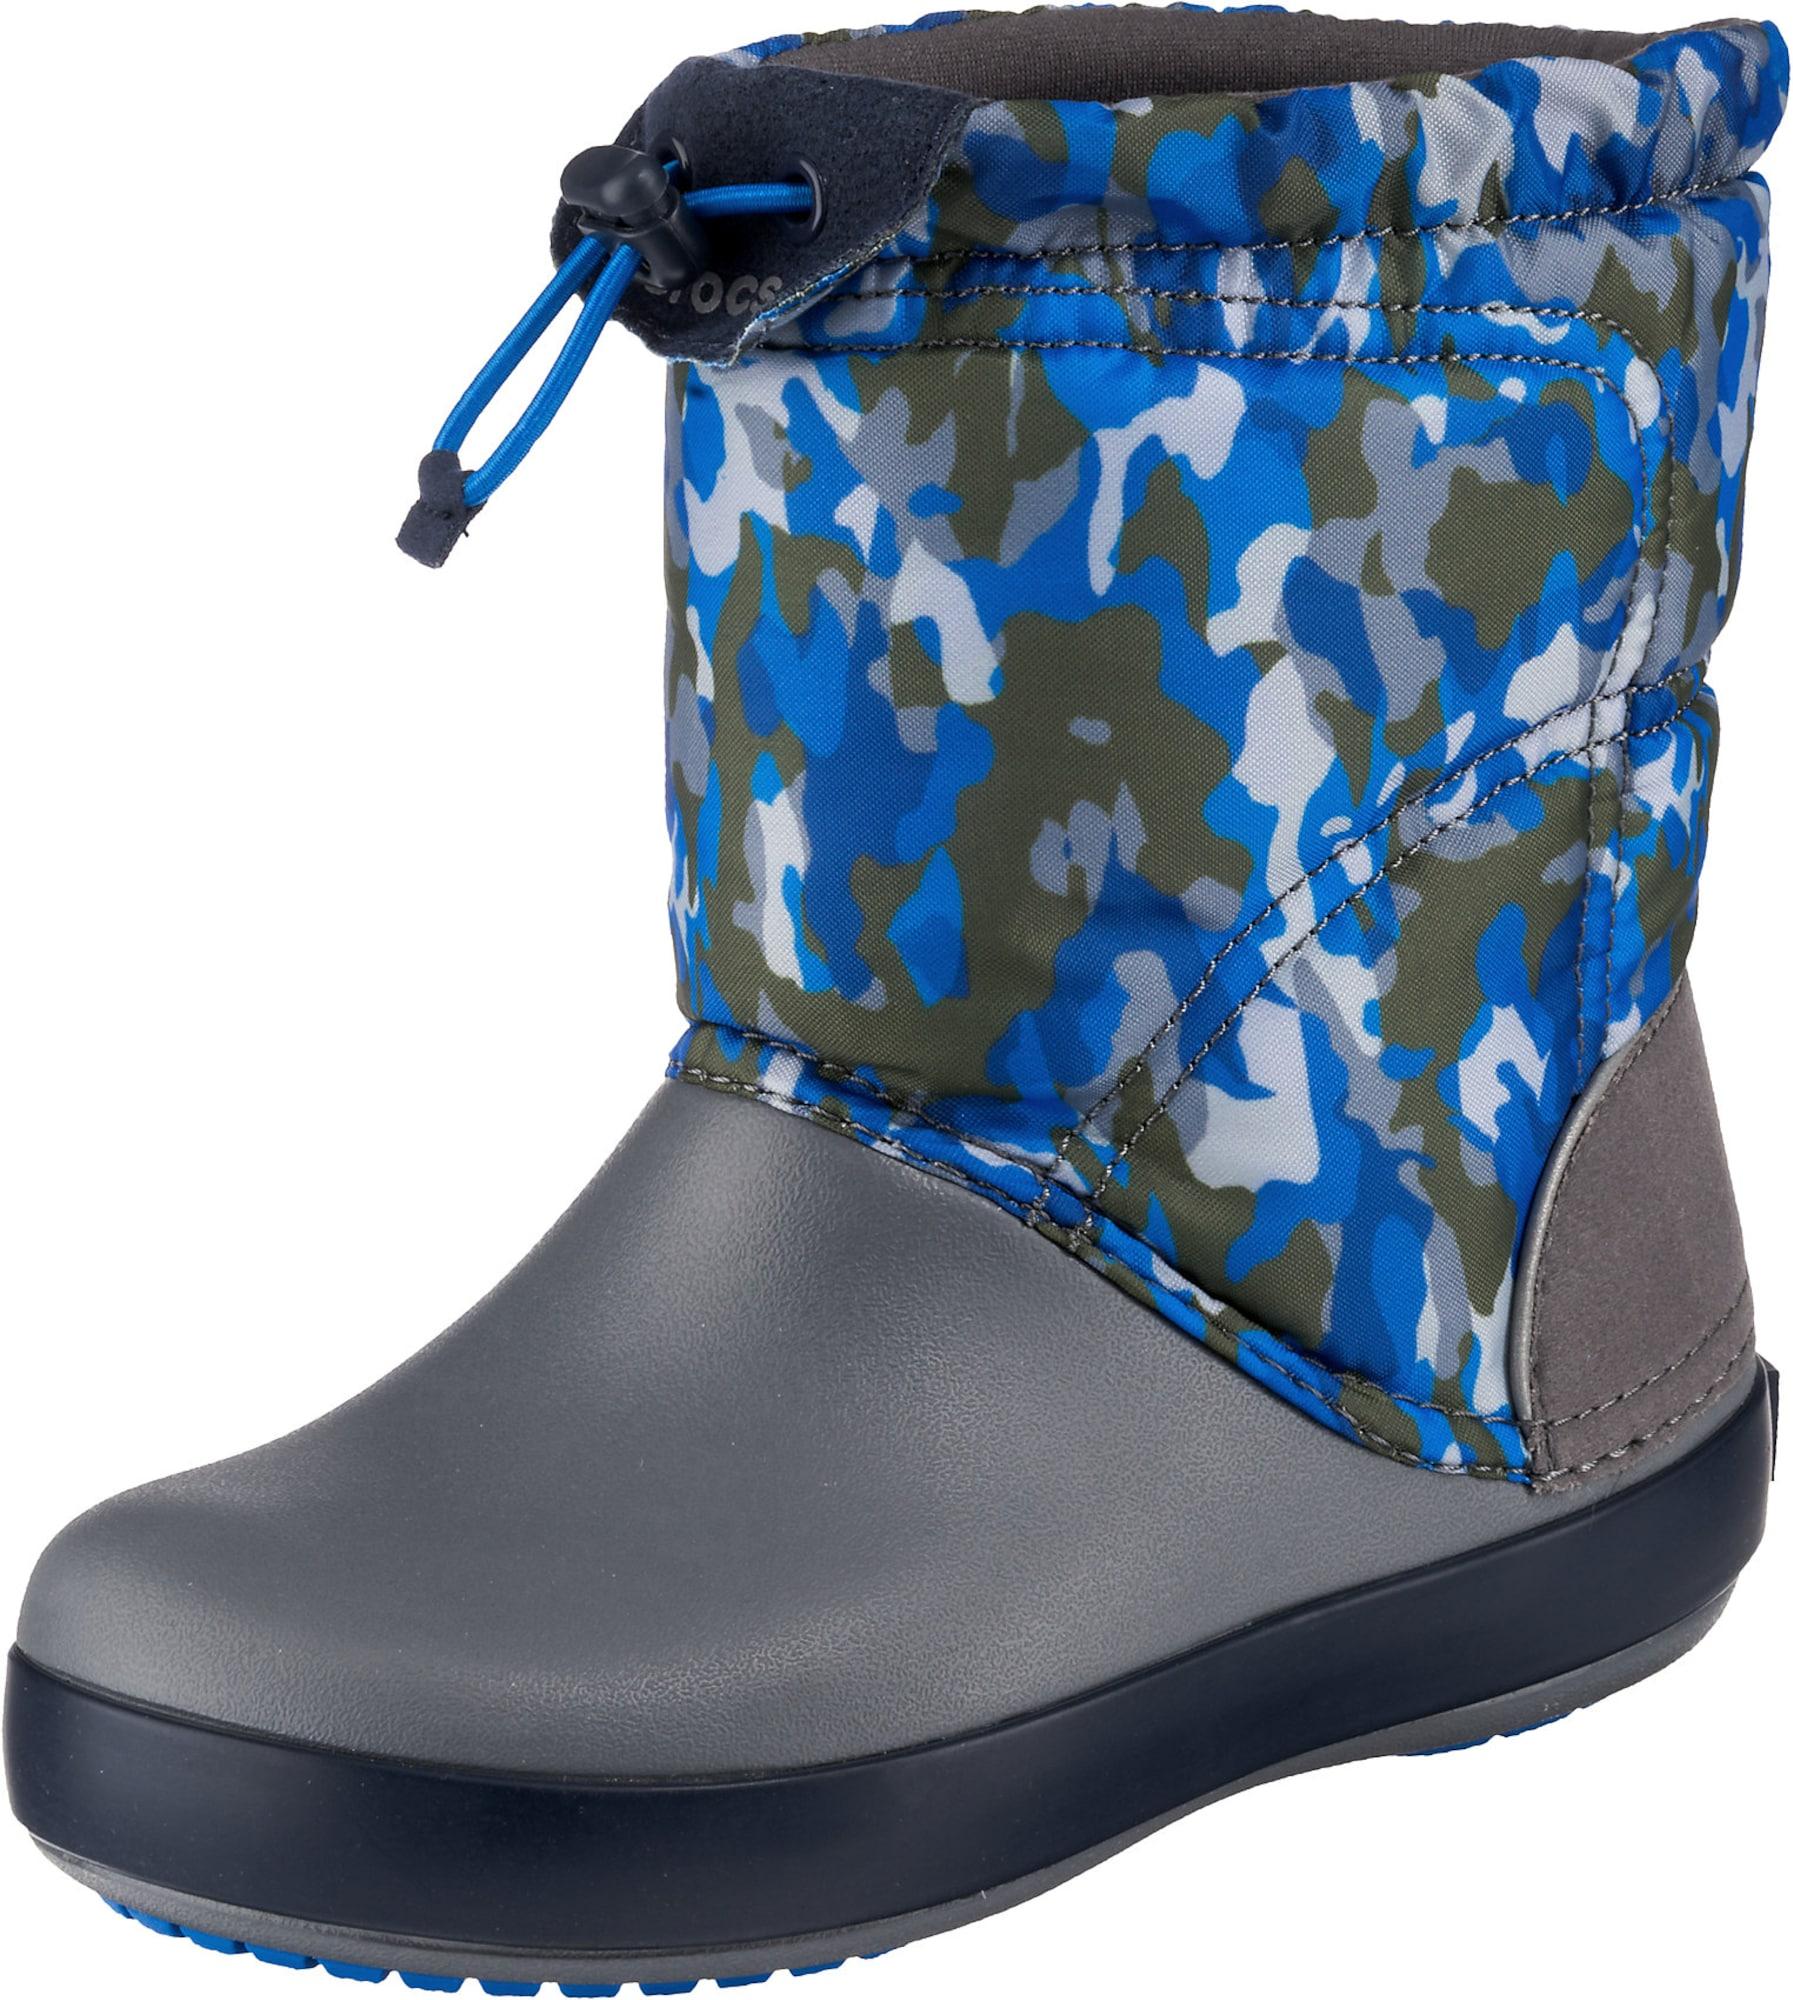 Crocs Sniego batai rusvai žalia / natūrali balta / mėlyna / pilka